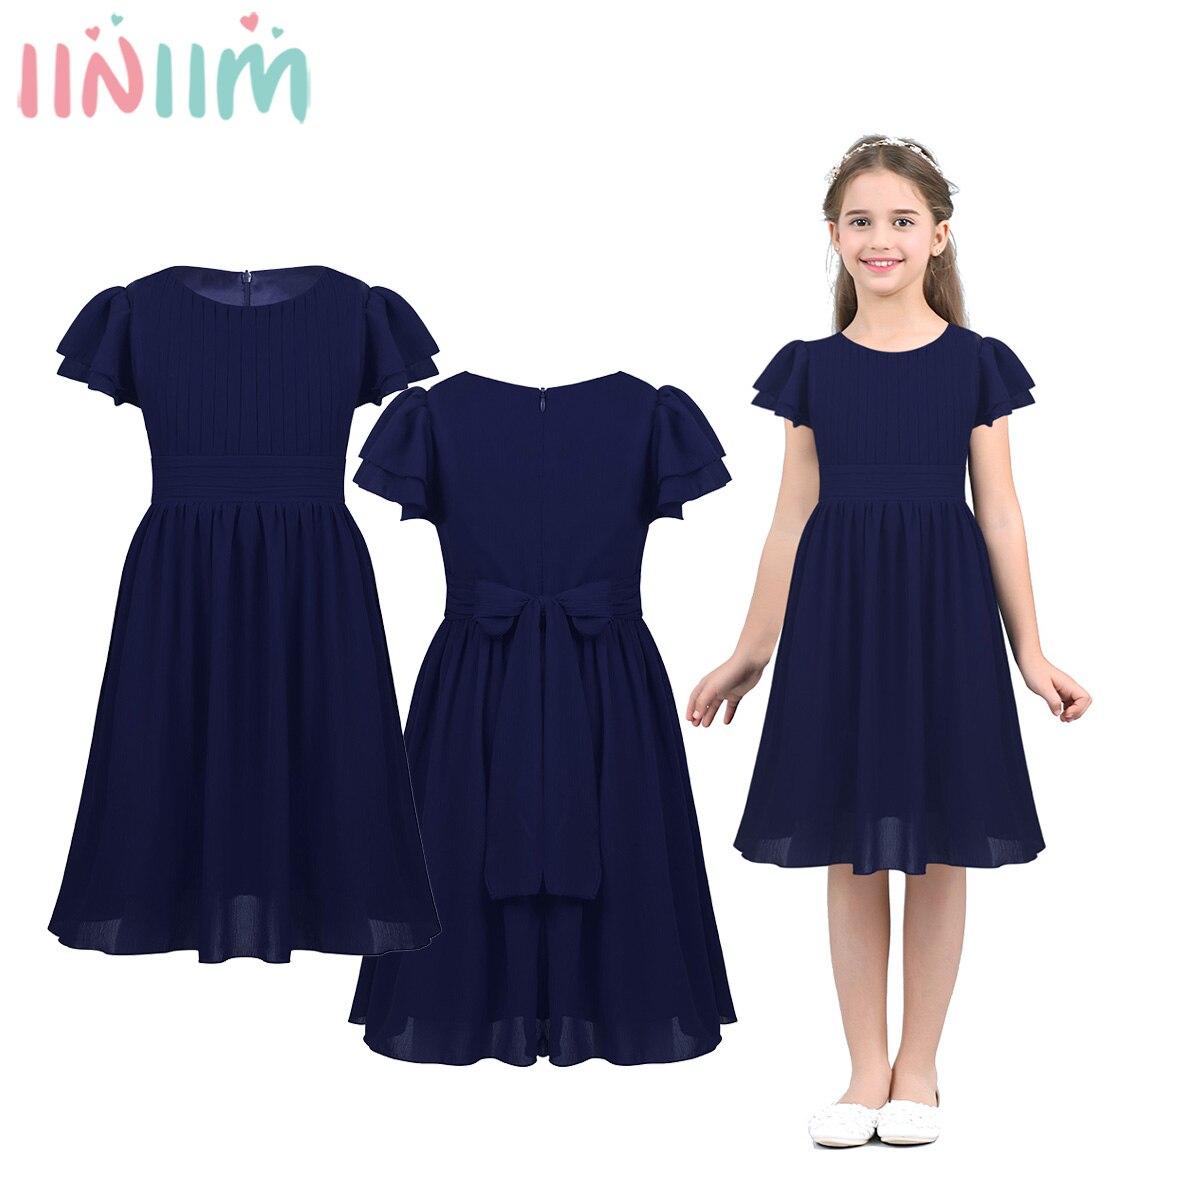 iiniim Kids Vestido de festa Priness Dress Layered Pleated Flower Girl Dress Summer Elegant Teen Wedding Birthday Party DressDresses   -